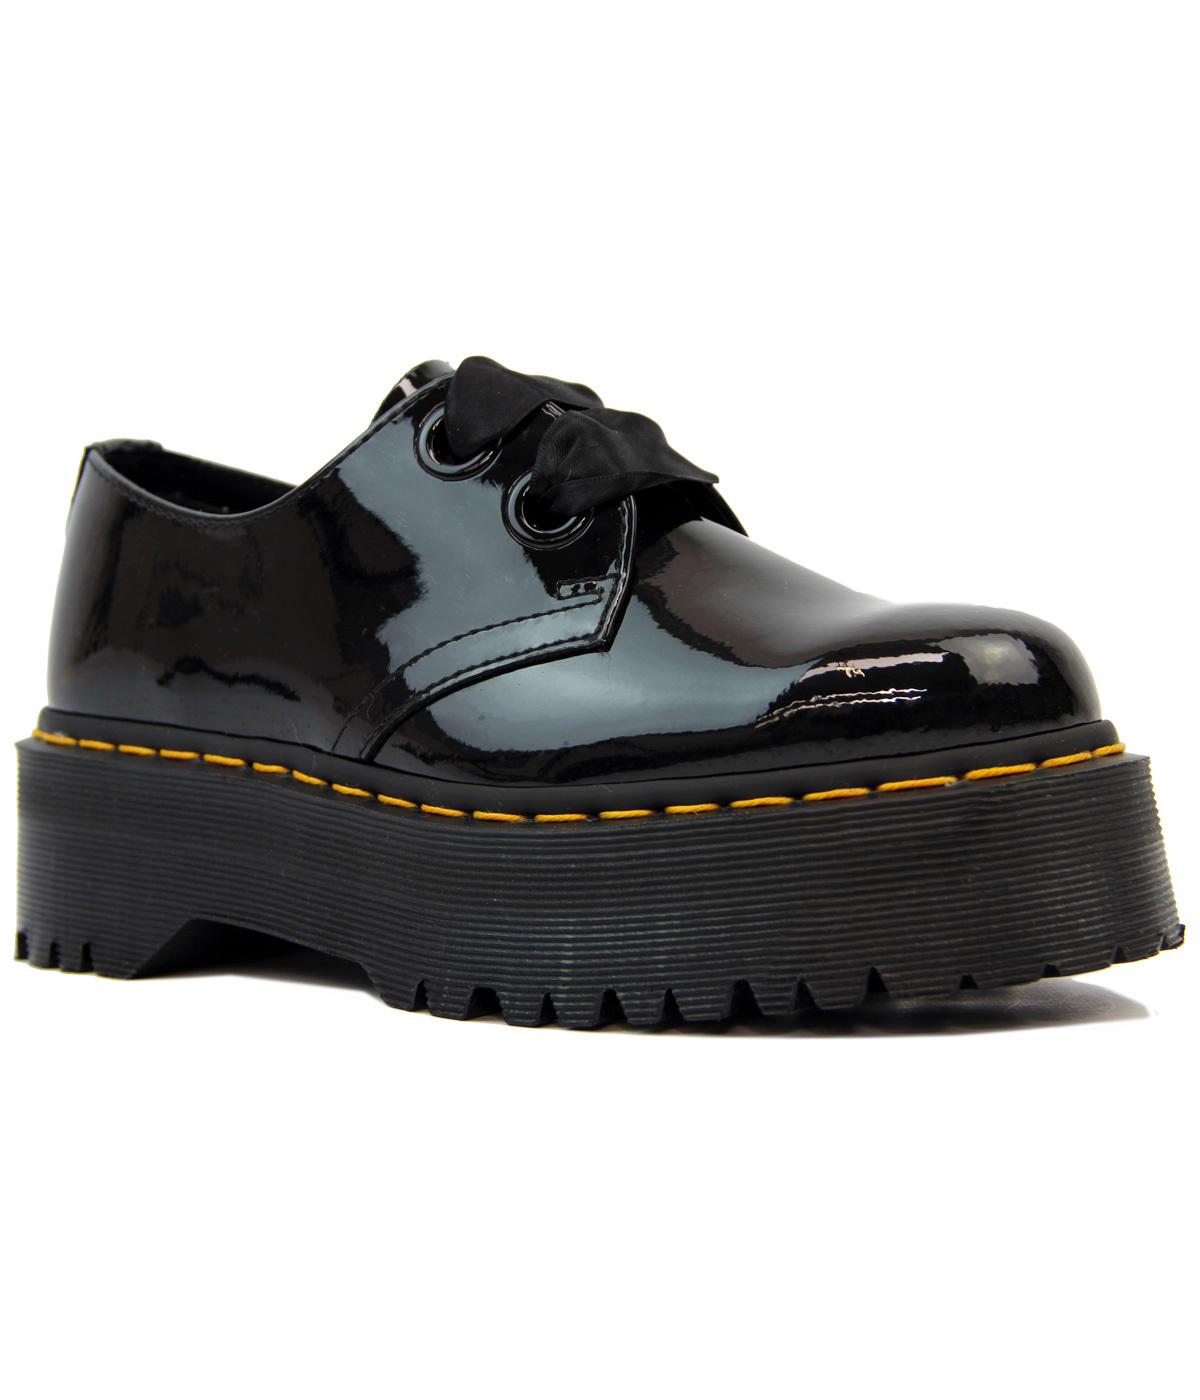 0a3fdab1e6 DR MARTENS Holly Retro Patent Lamper Lolita Shoes in Black